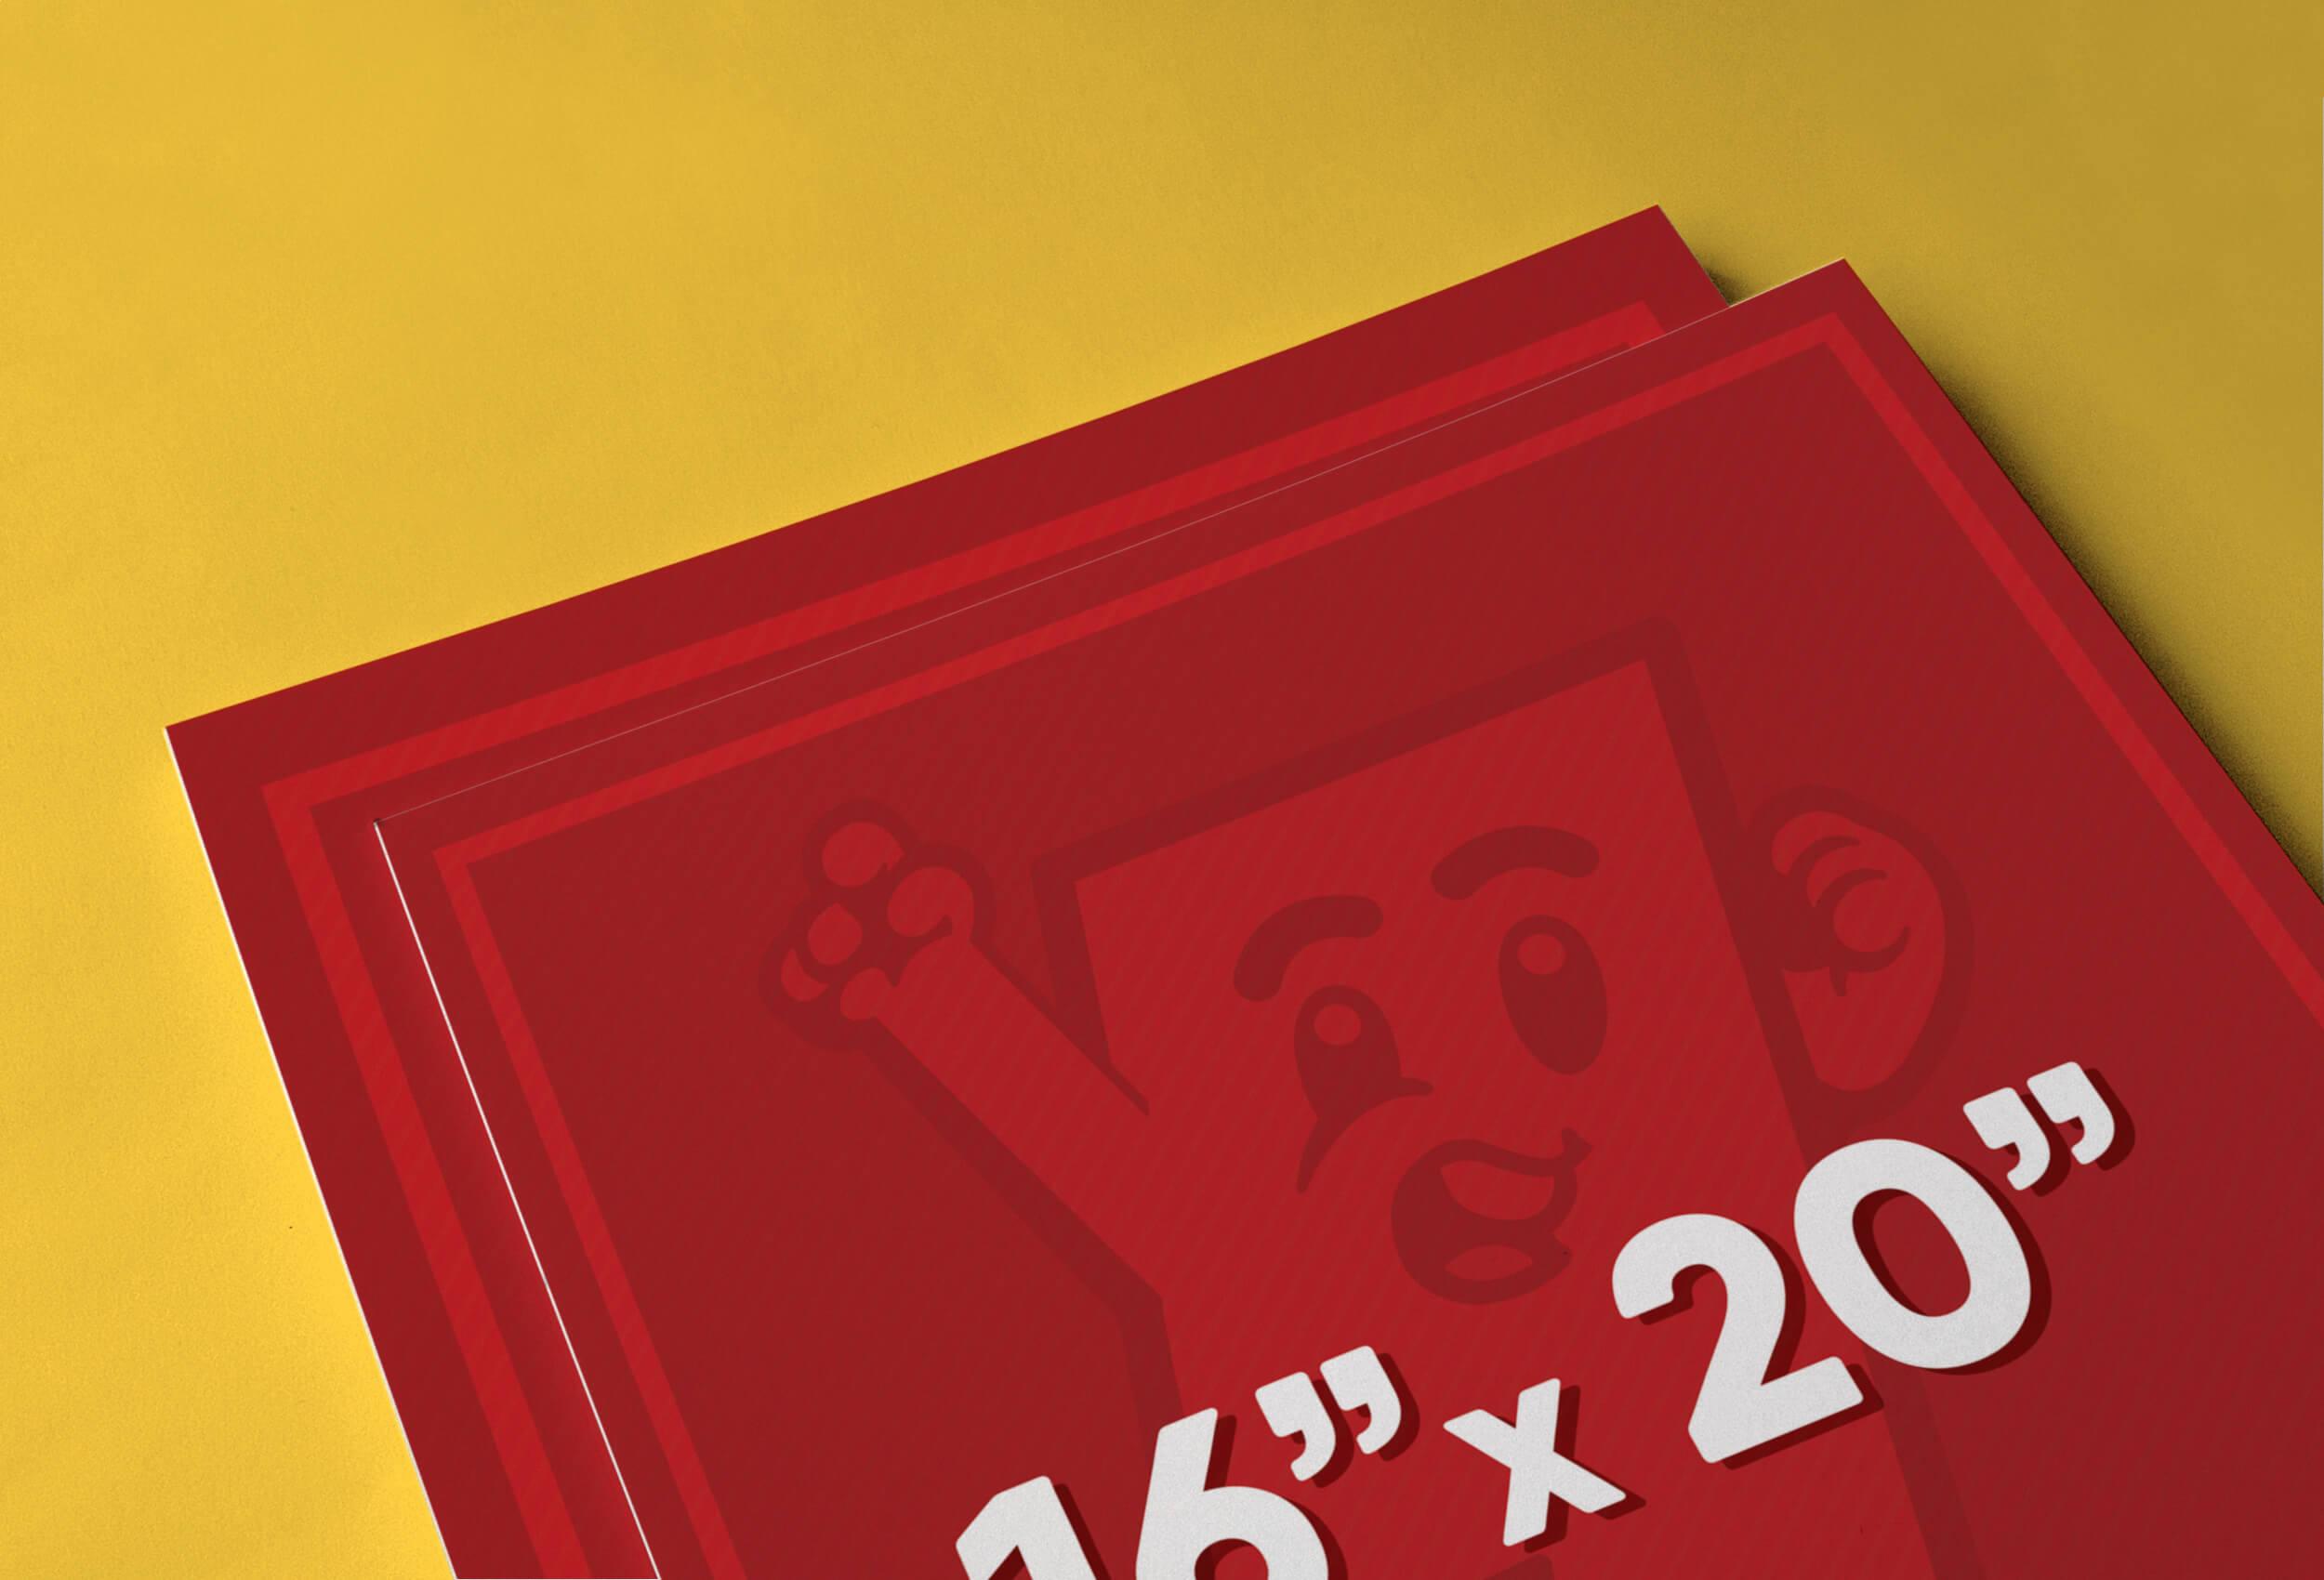 16″ x 20″ Poster Printing